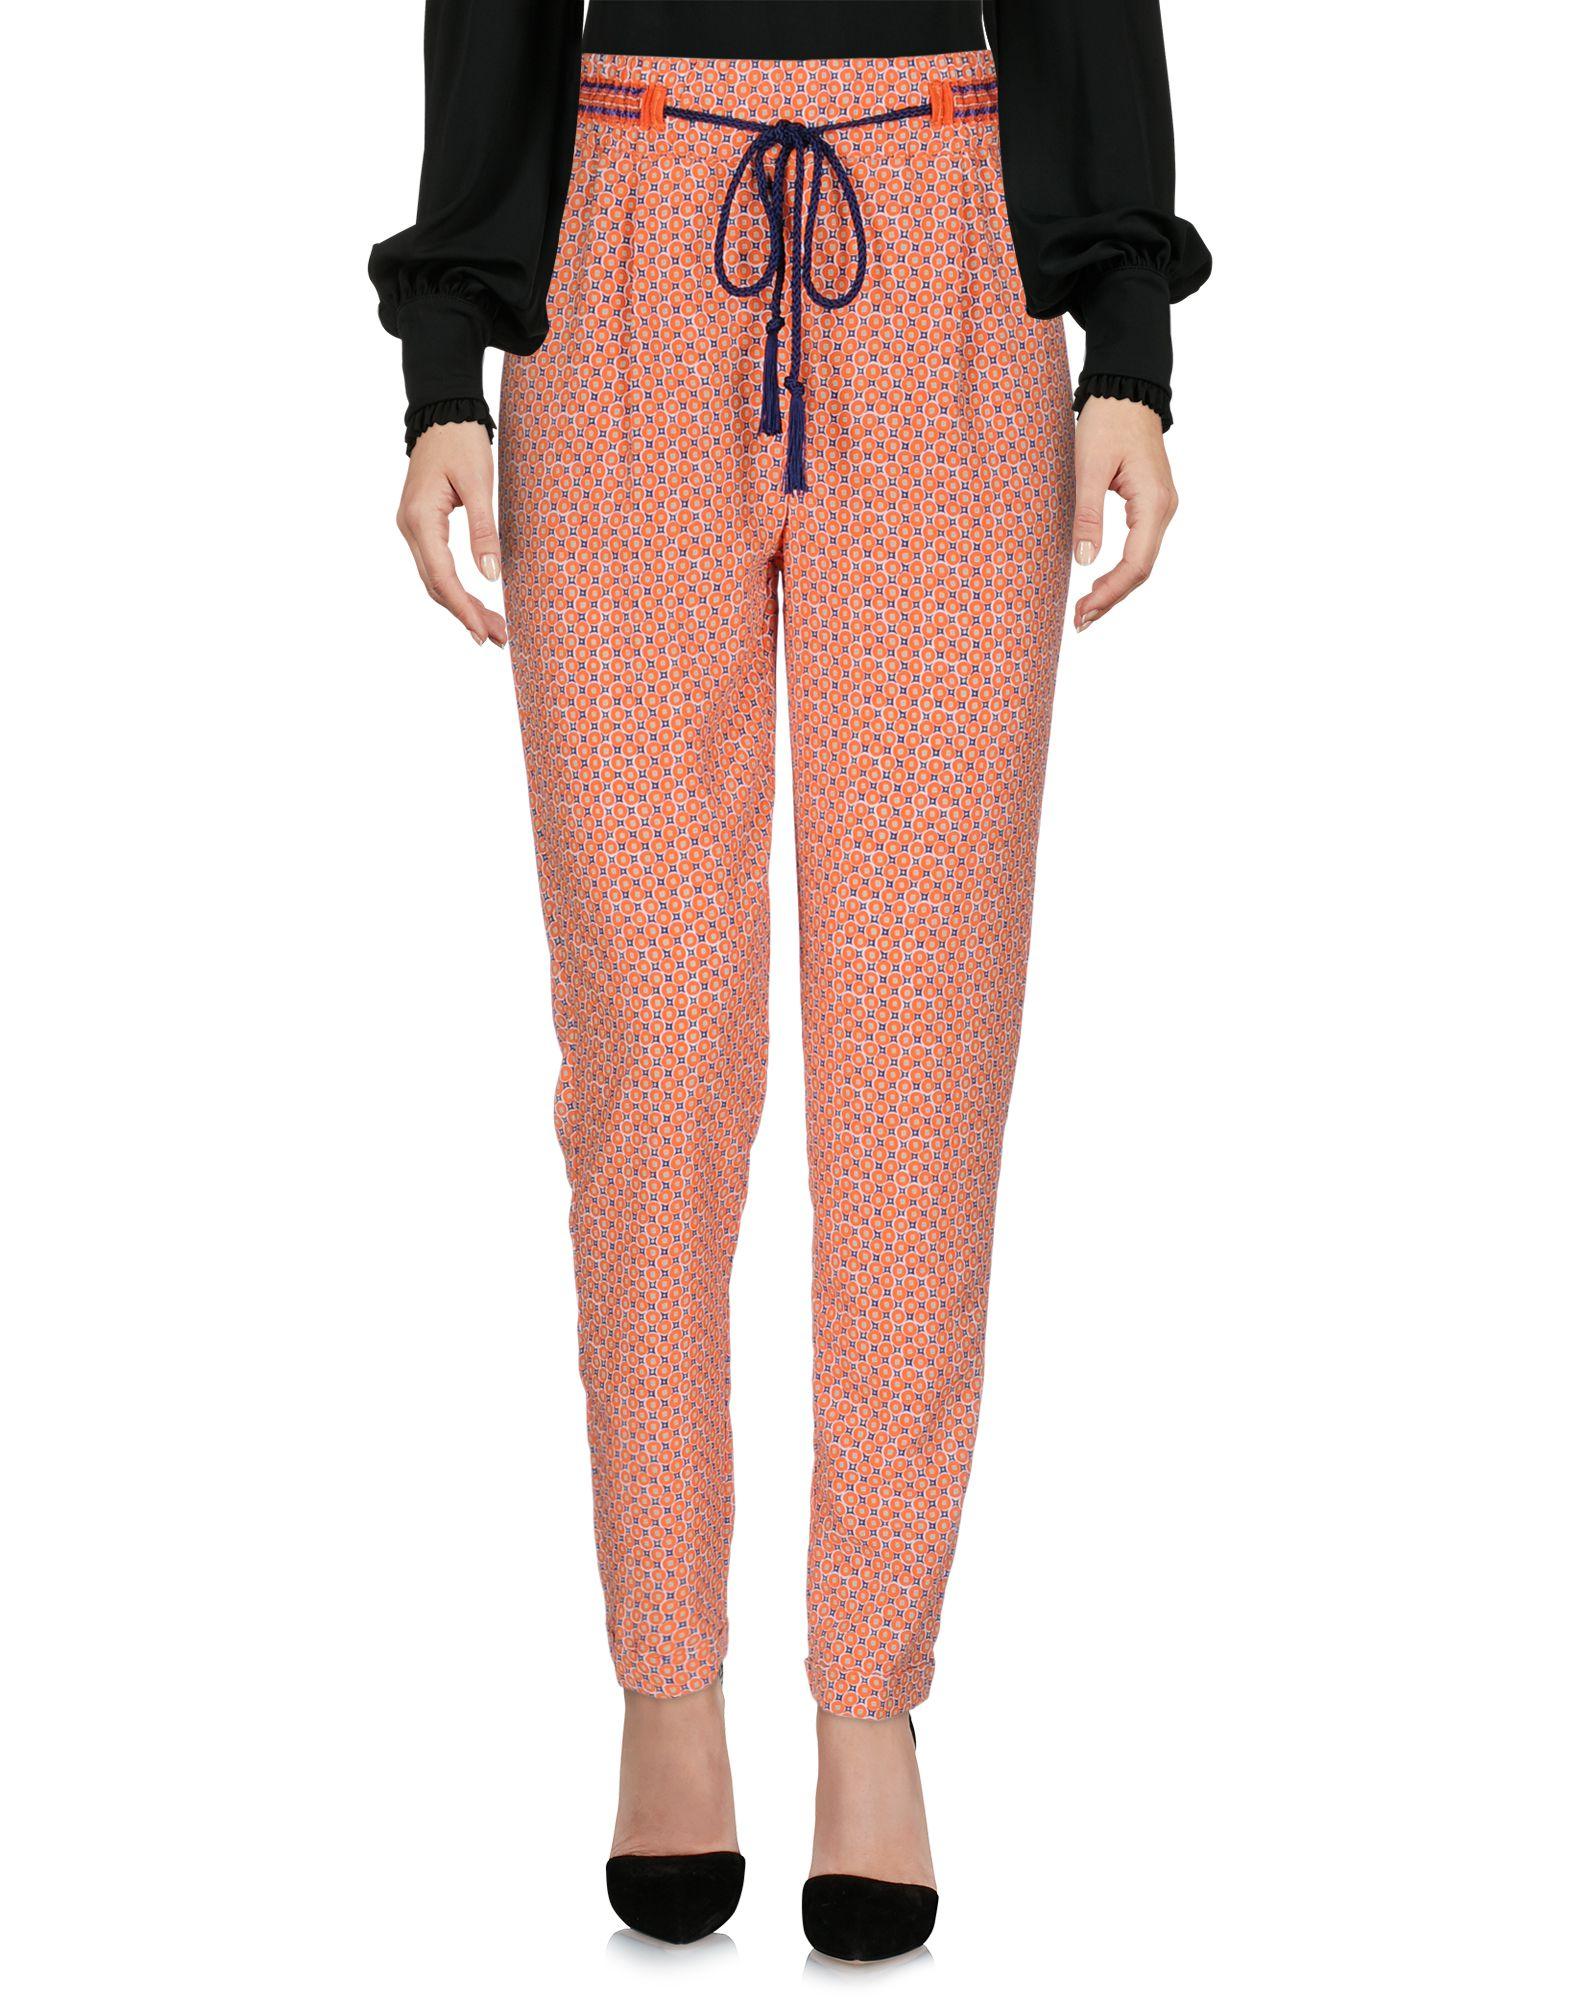 Pantalone Sfizio donna donna donna - 13075128SR 6f7